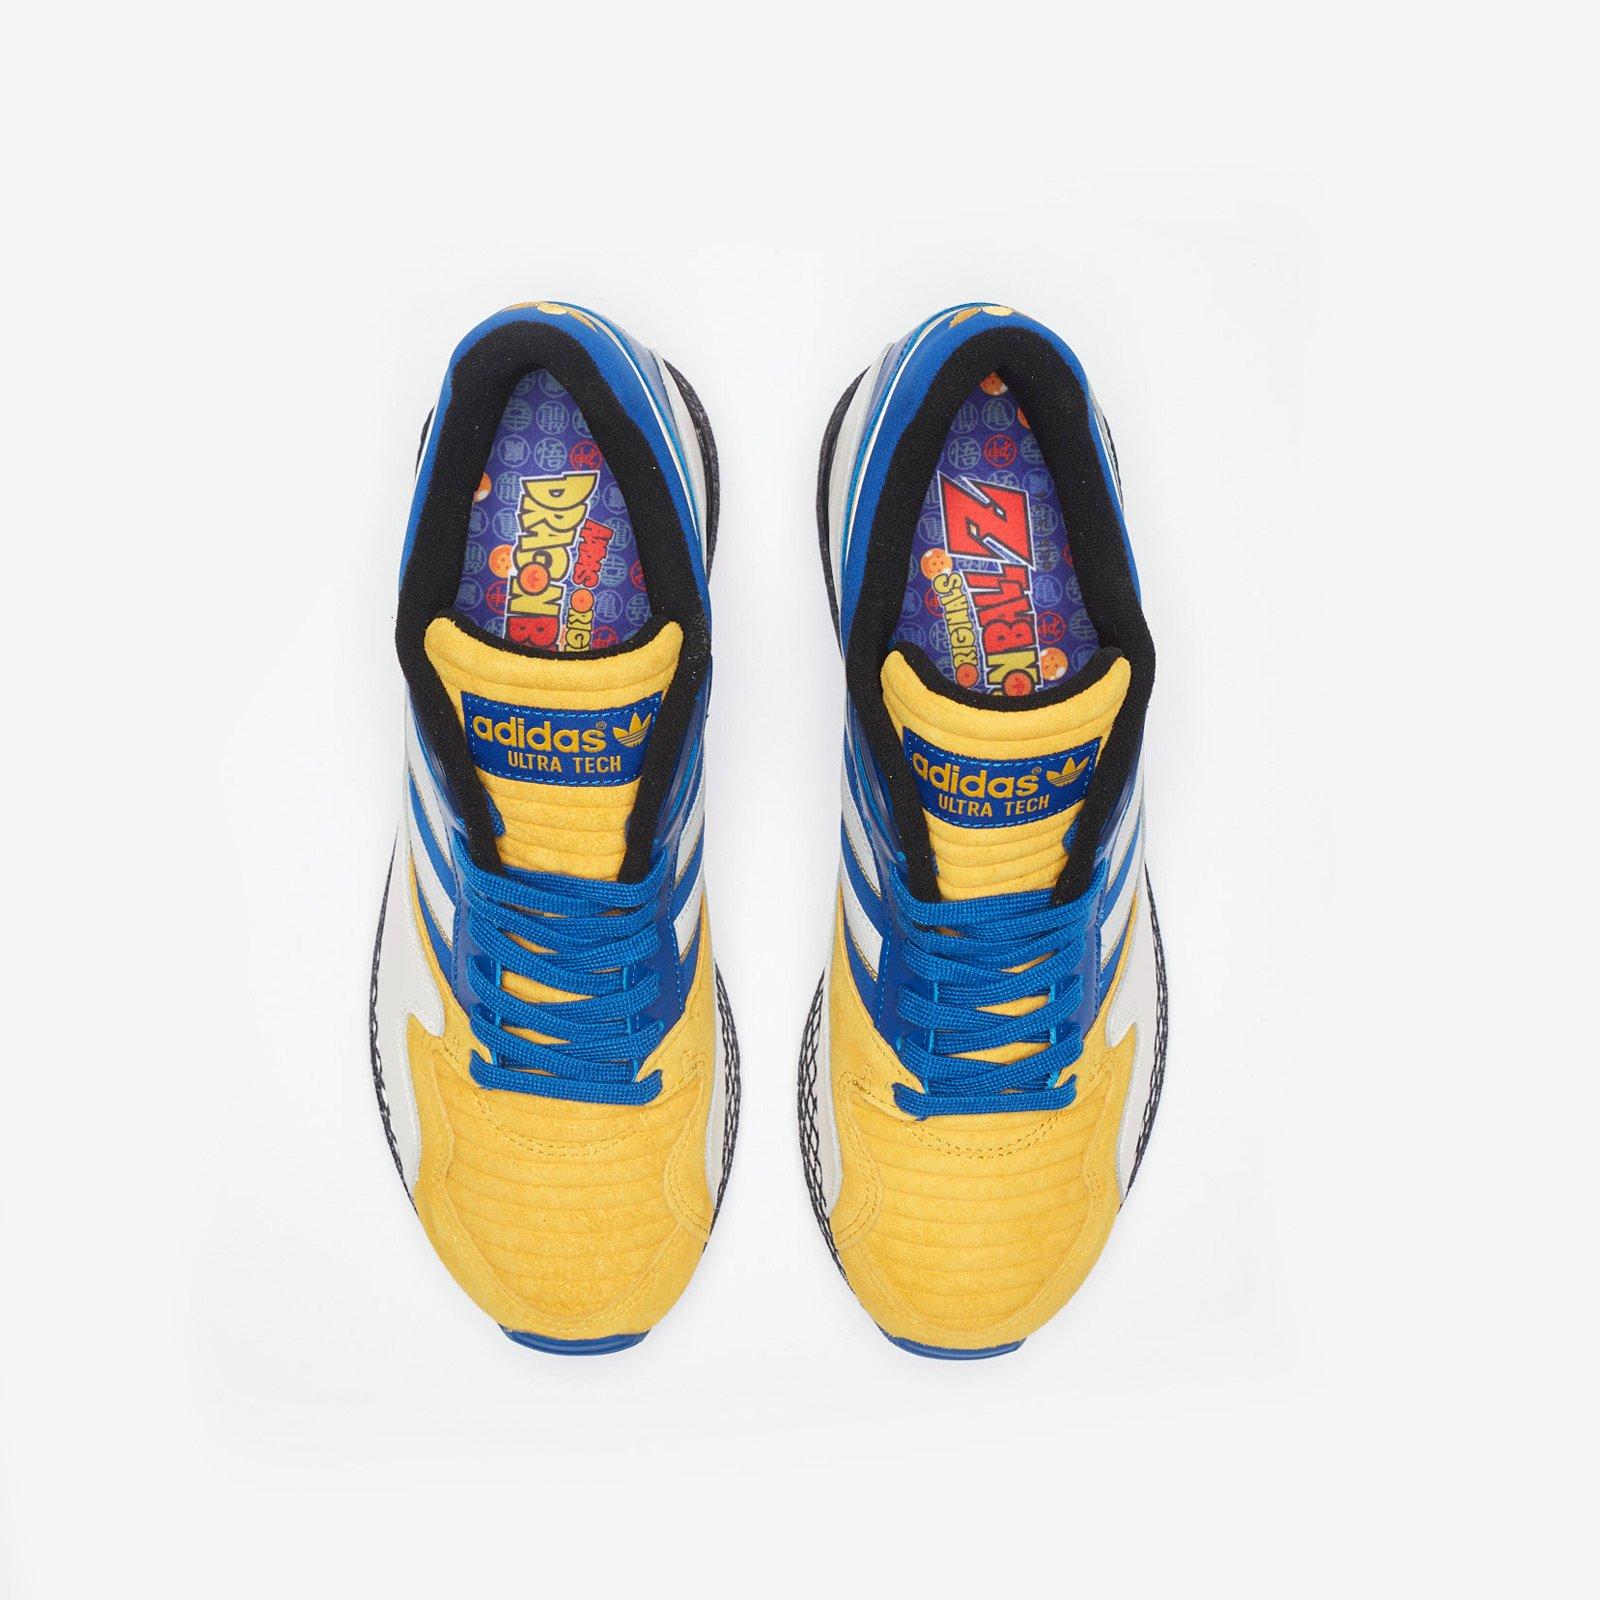 Z Ball Dragon x Originals Adidas Ultra 7.5 US 40 F Vegeta